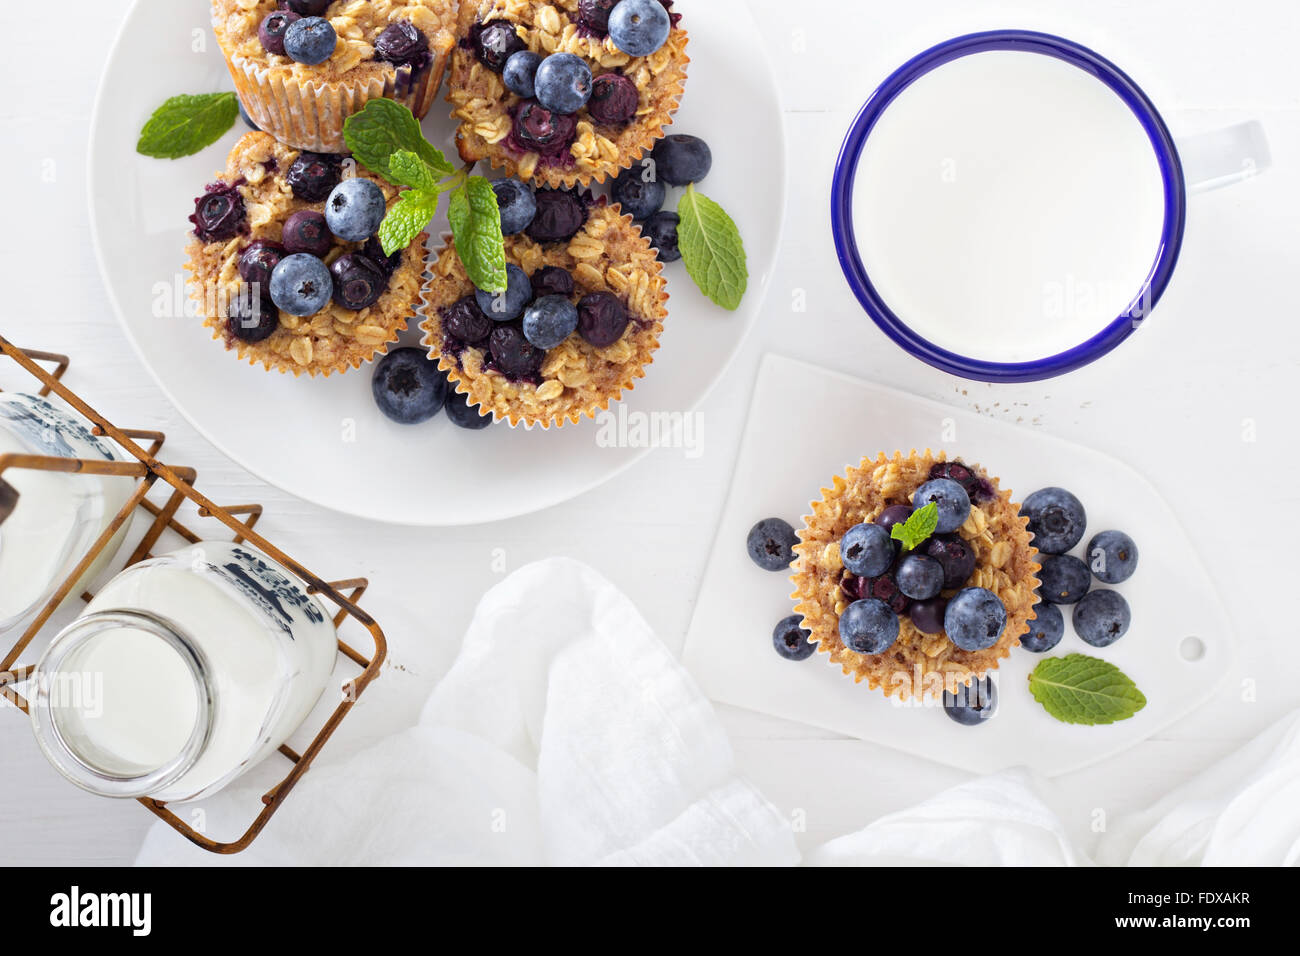 Muffins de avena cocida con leche servida con arándanos Imagen De Stock